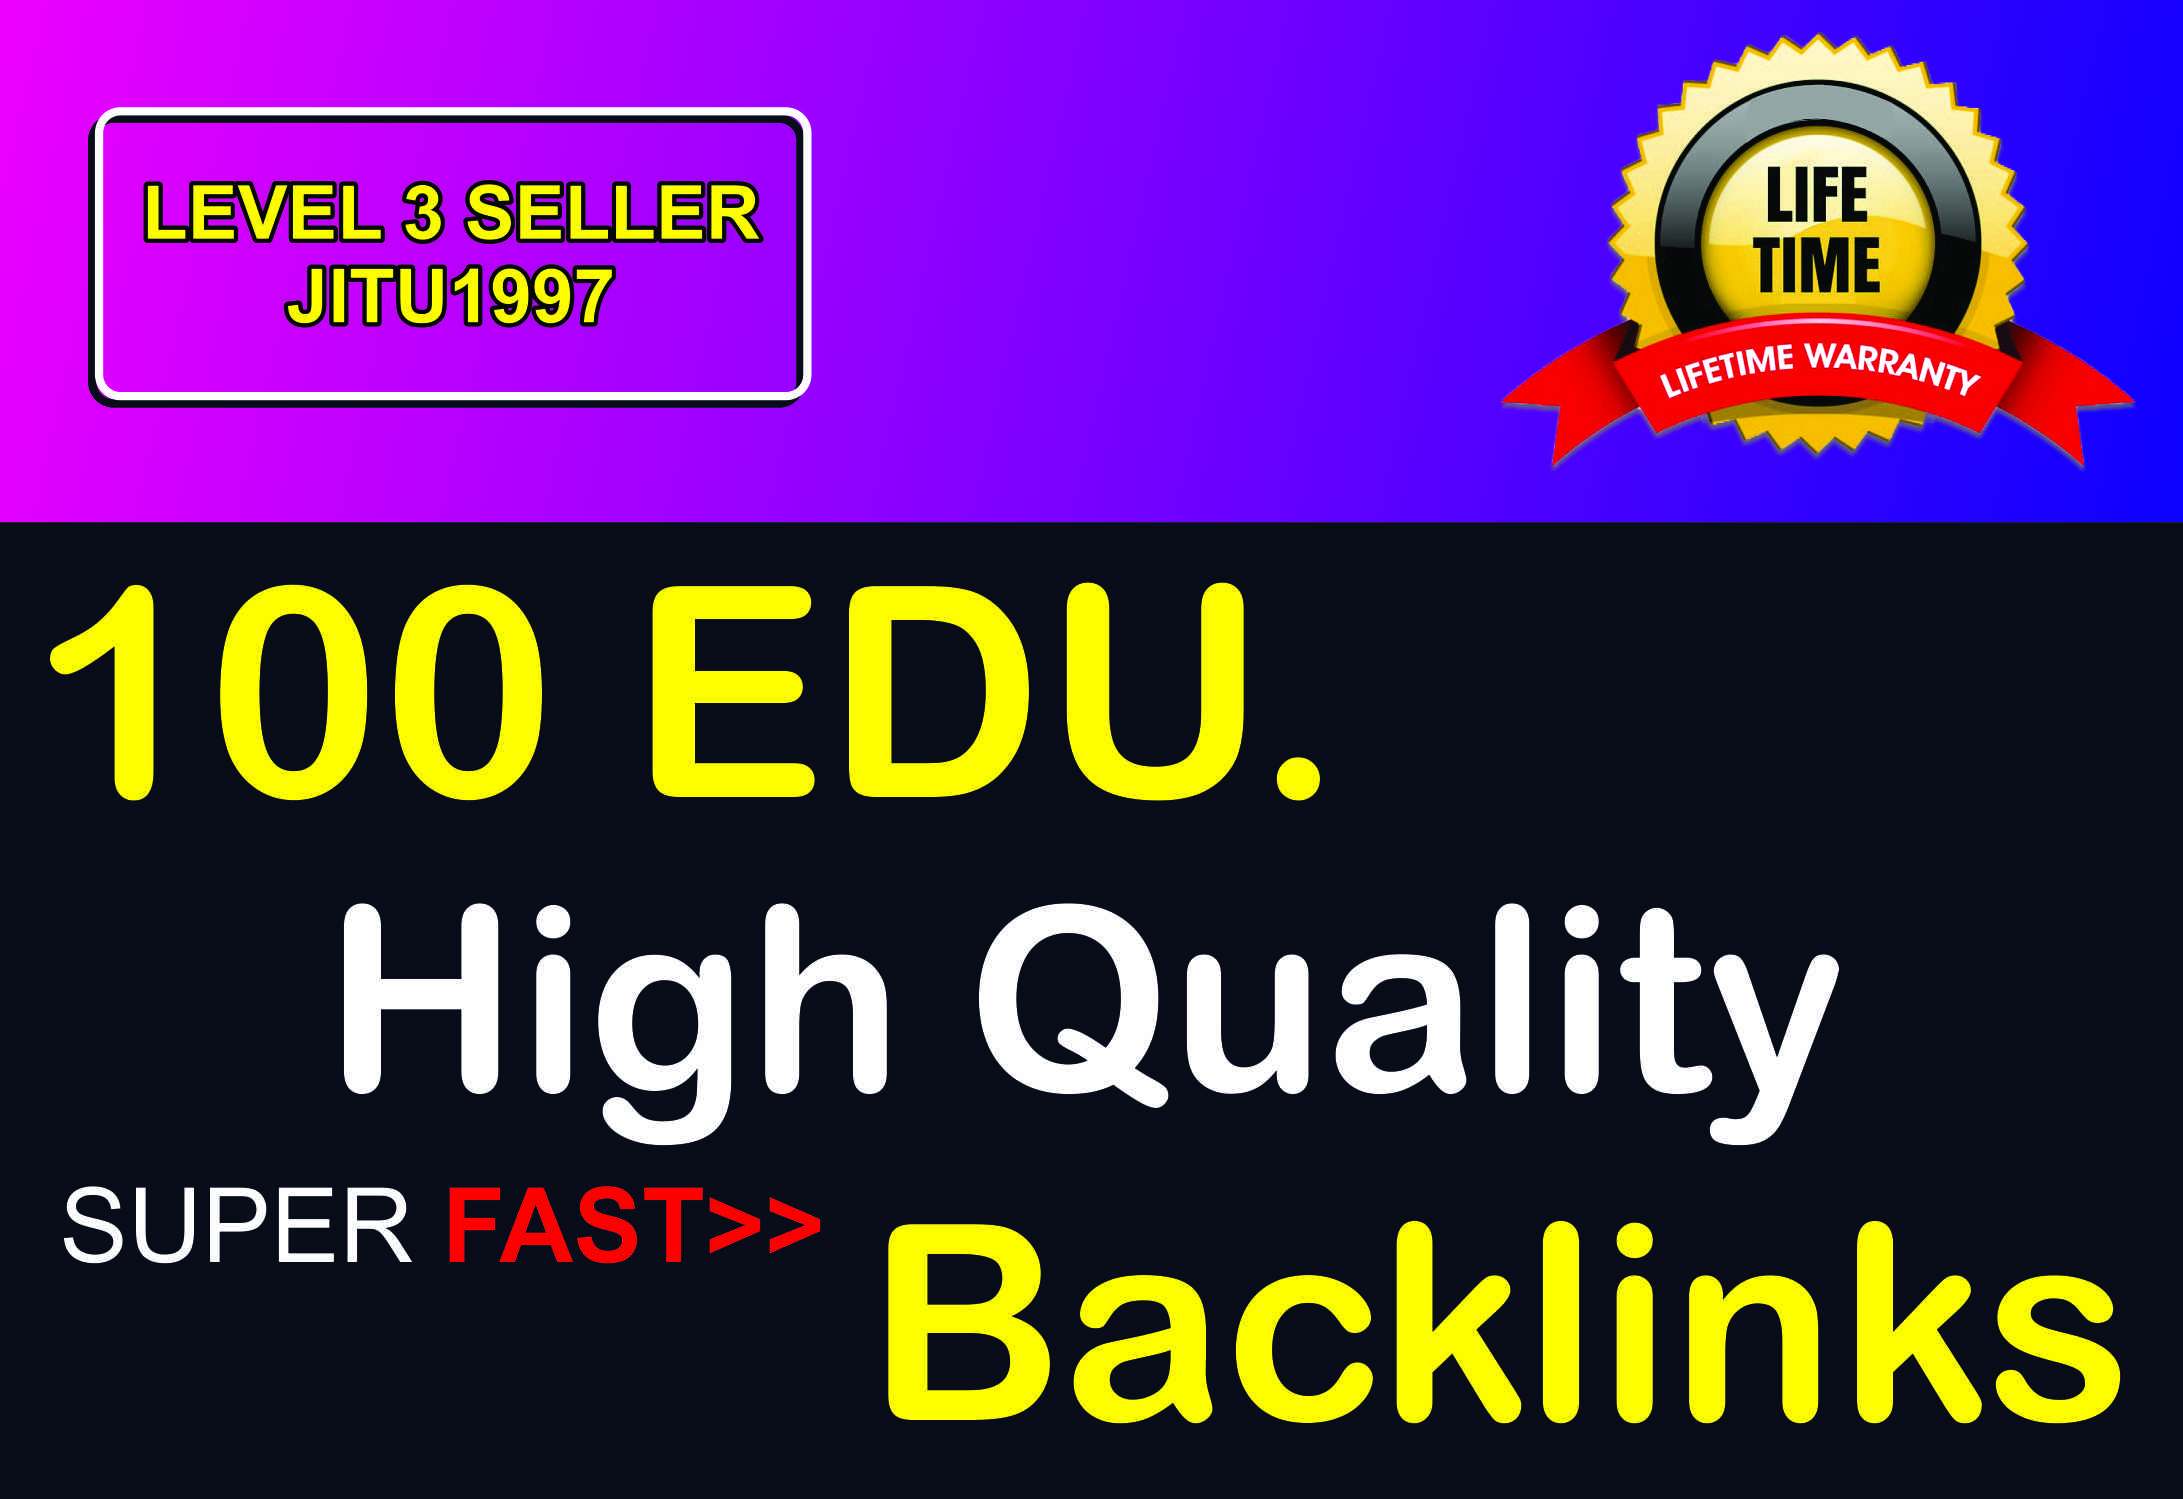 I Will Provide High Quality 100 EDU Backlinks